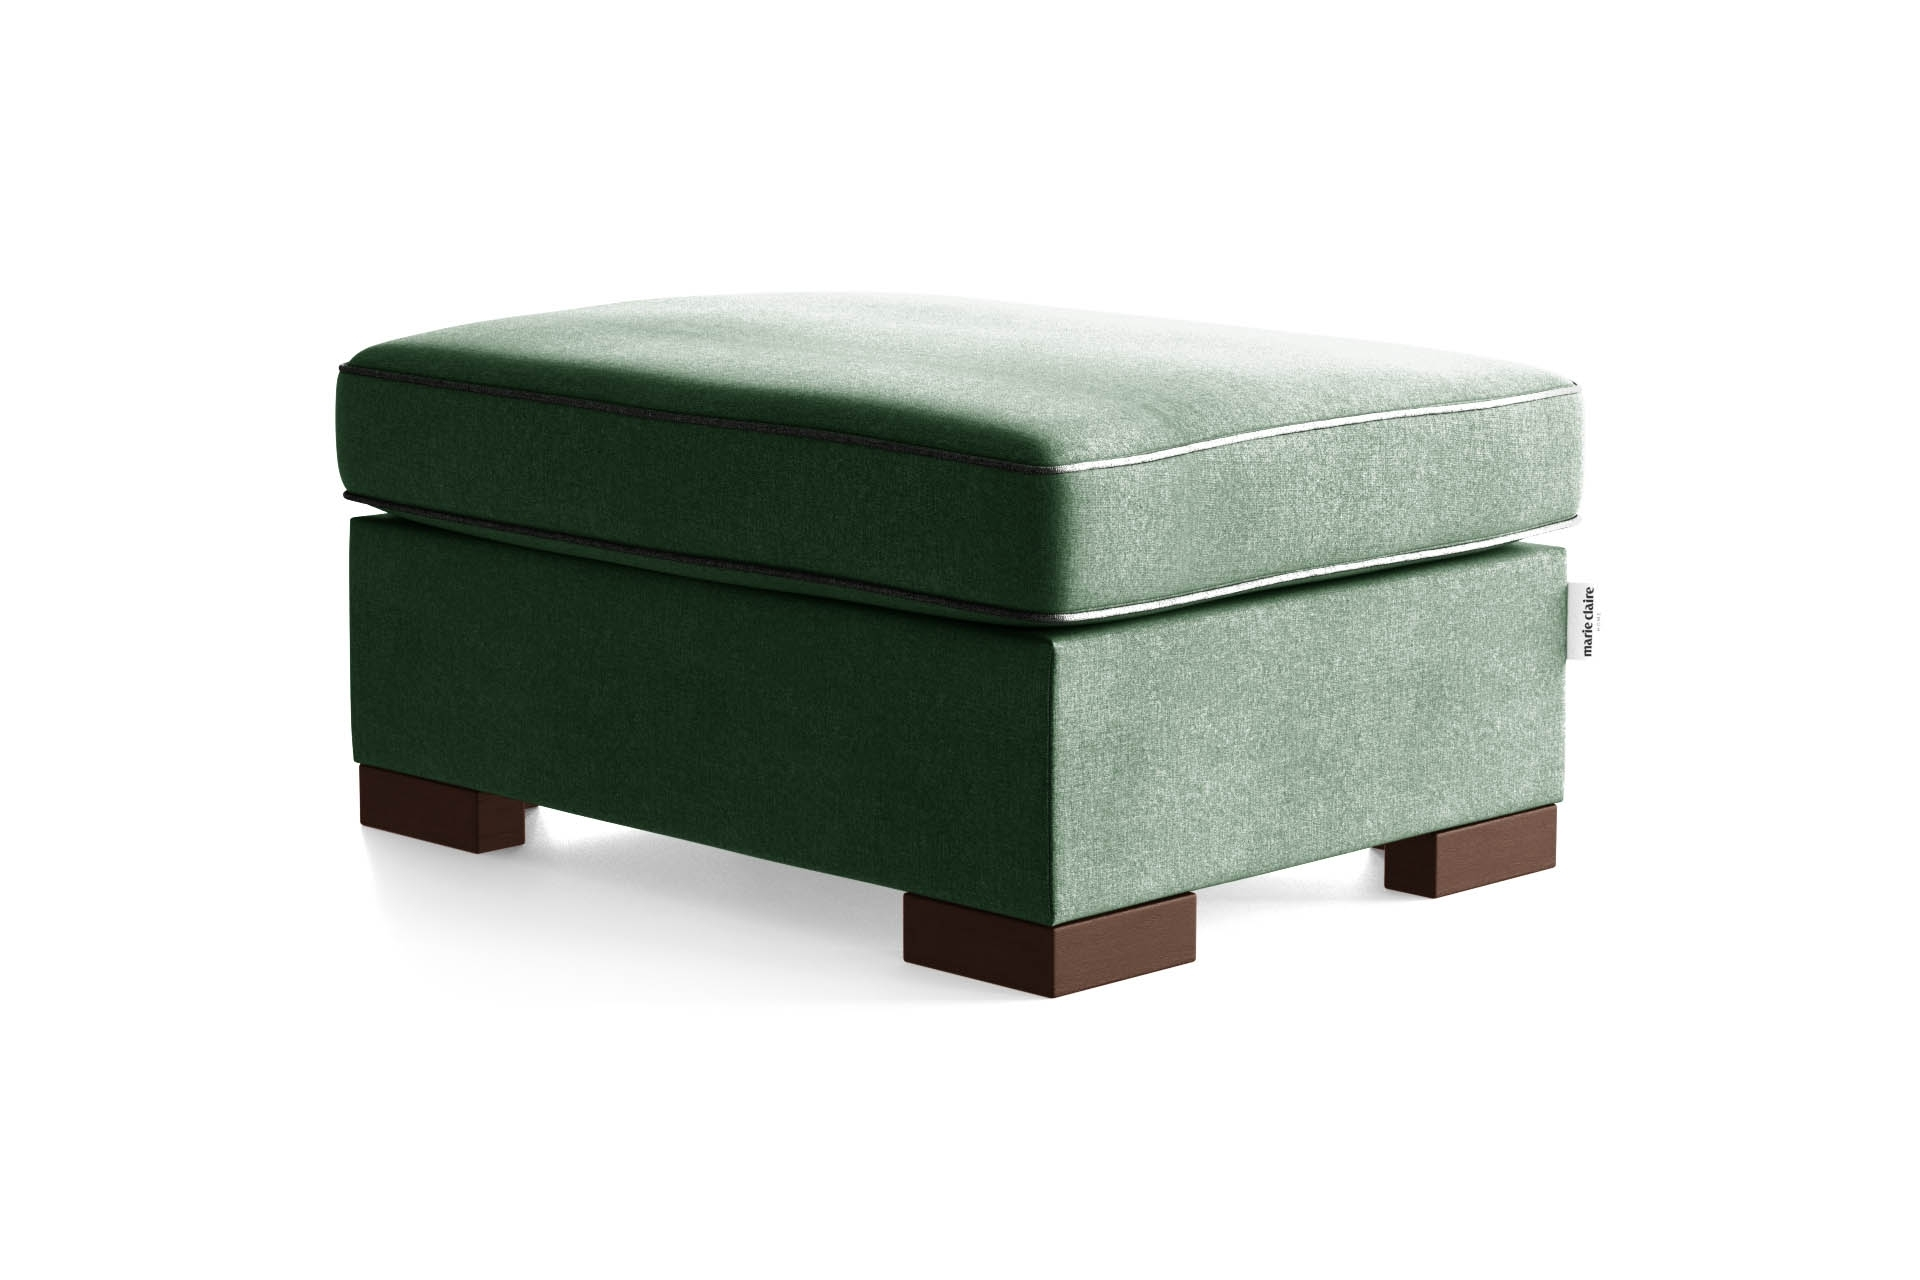 Pouf 1 place toucher coton vert bouteuille/anthracite